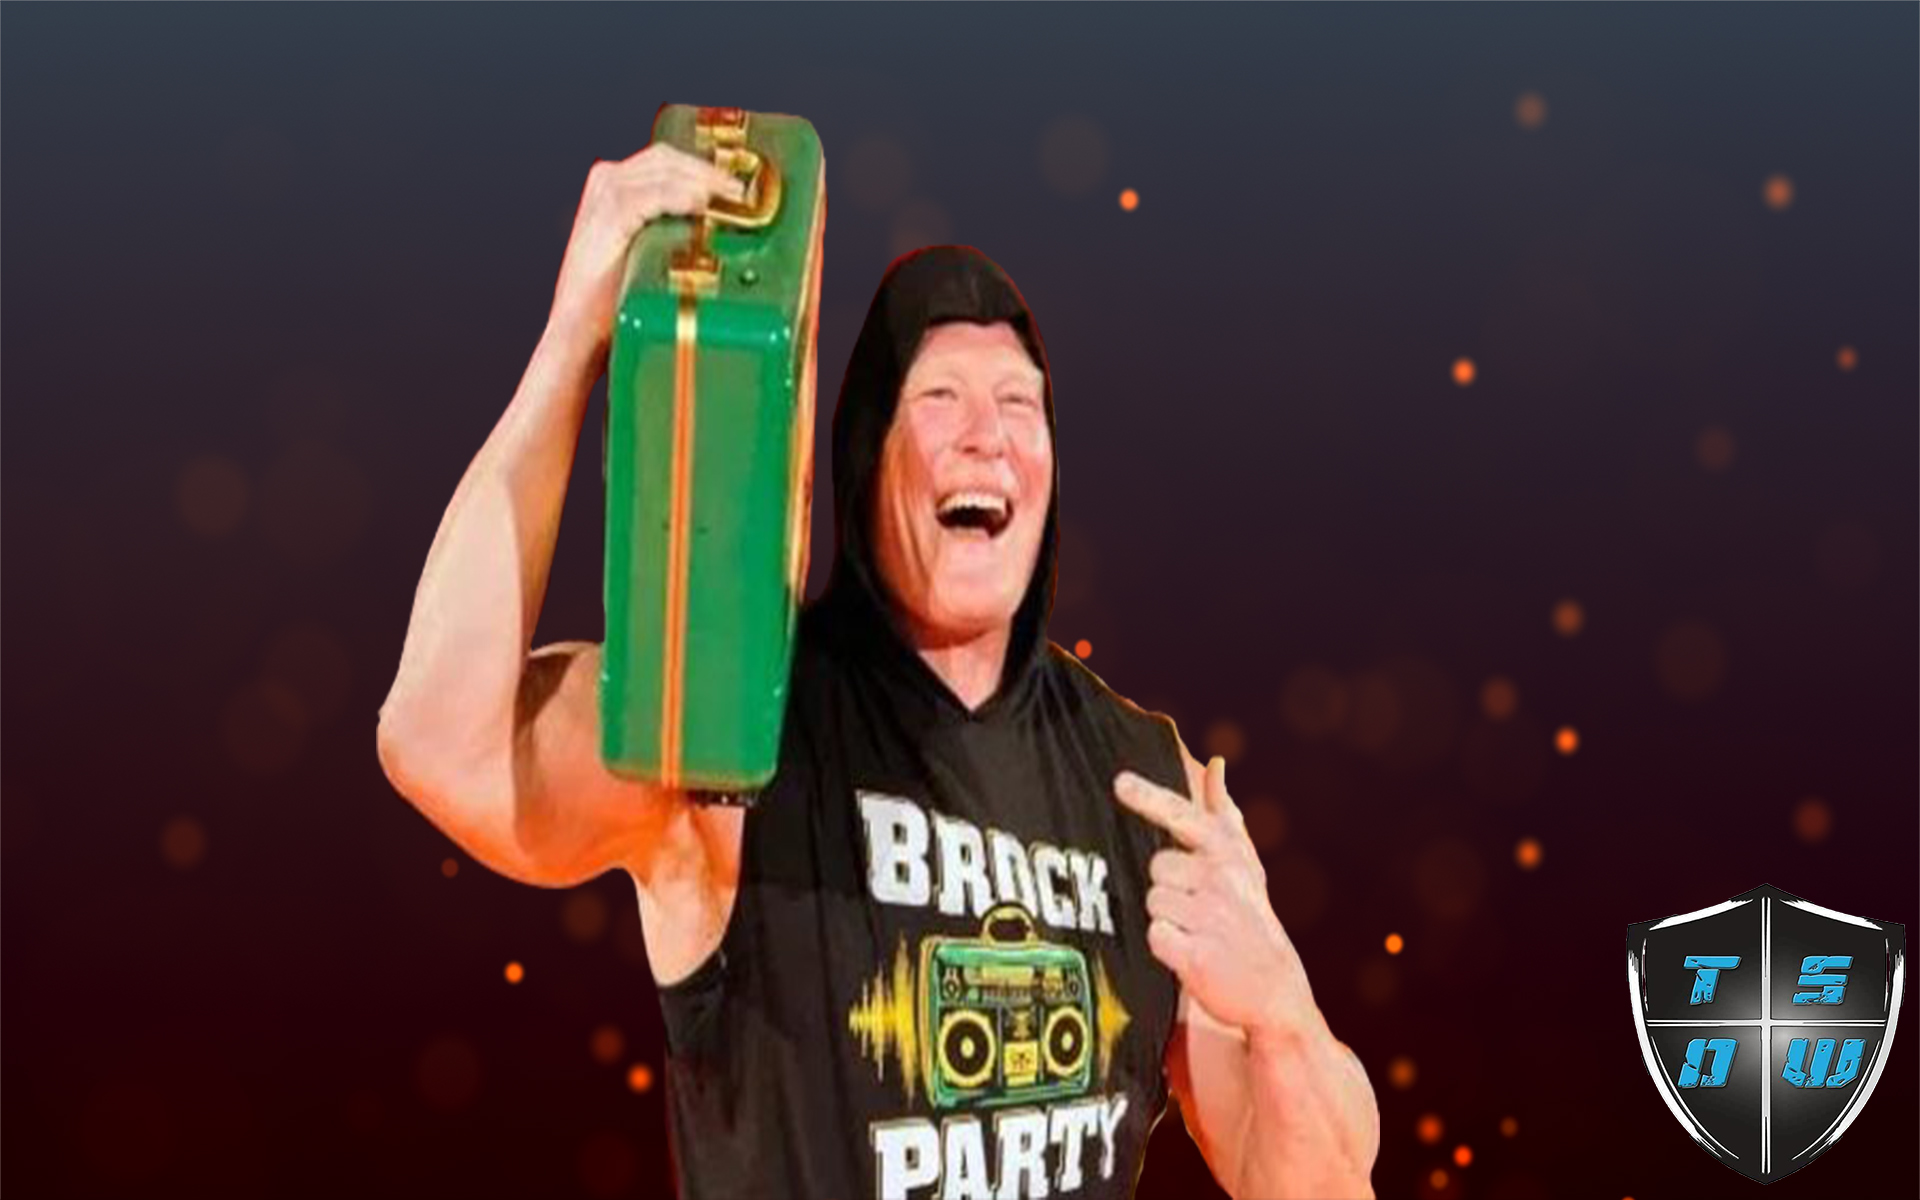 Brock Lesnar presente per incassare